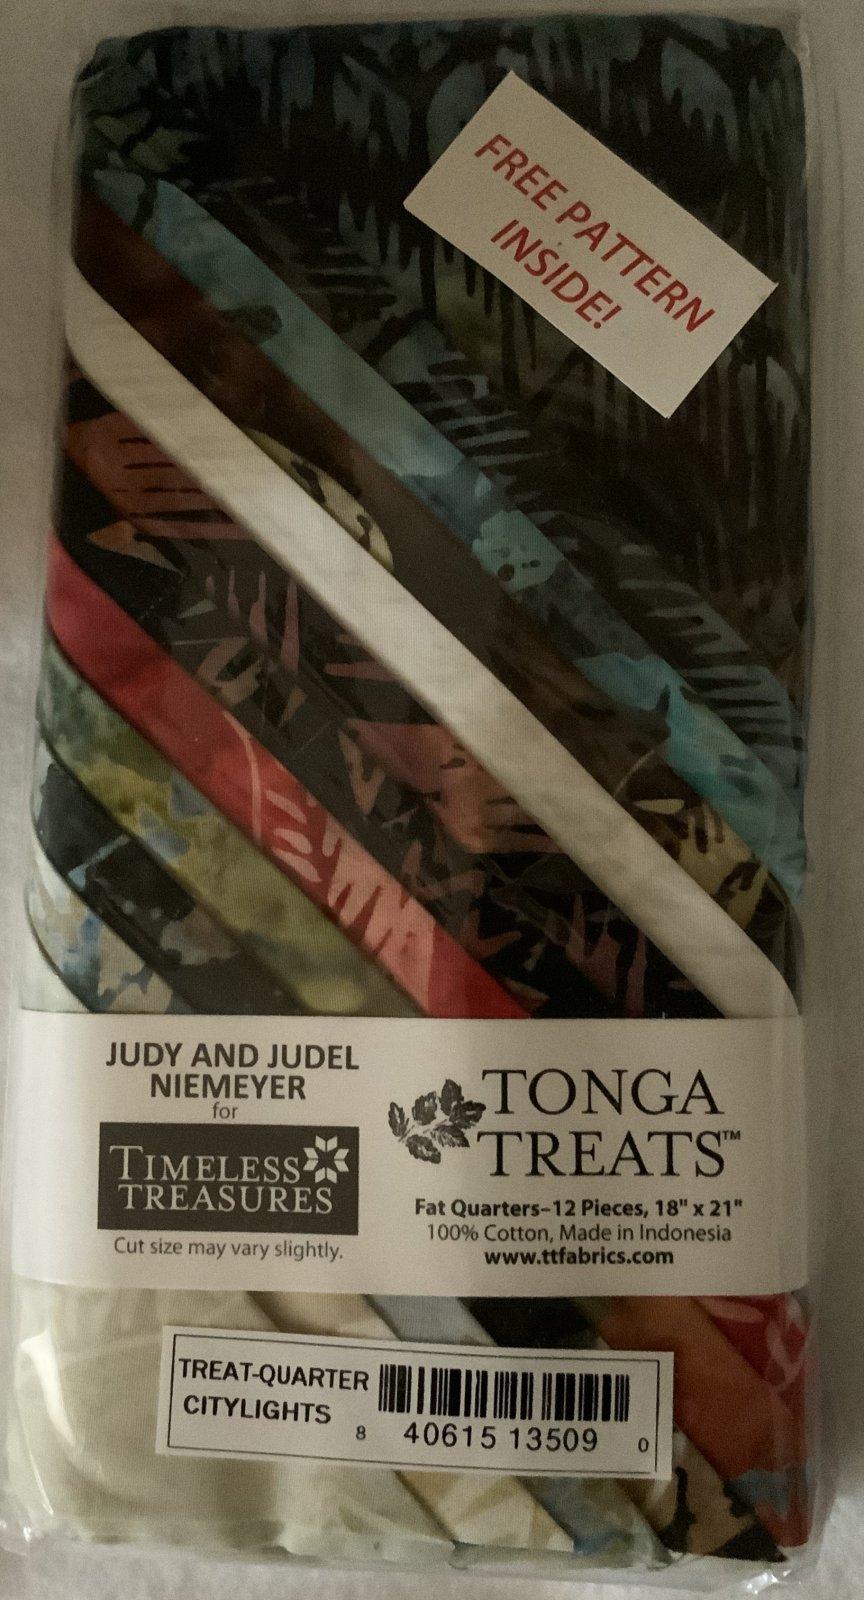 Tonga Treat Fat Quarters City Lights (18in x 21in) 12pcs - Timeless Treasures